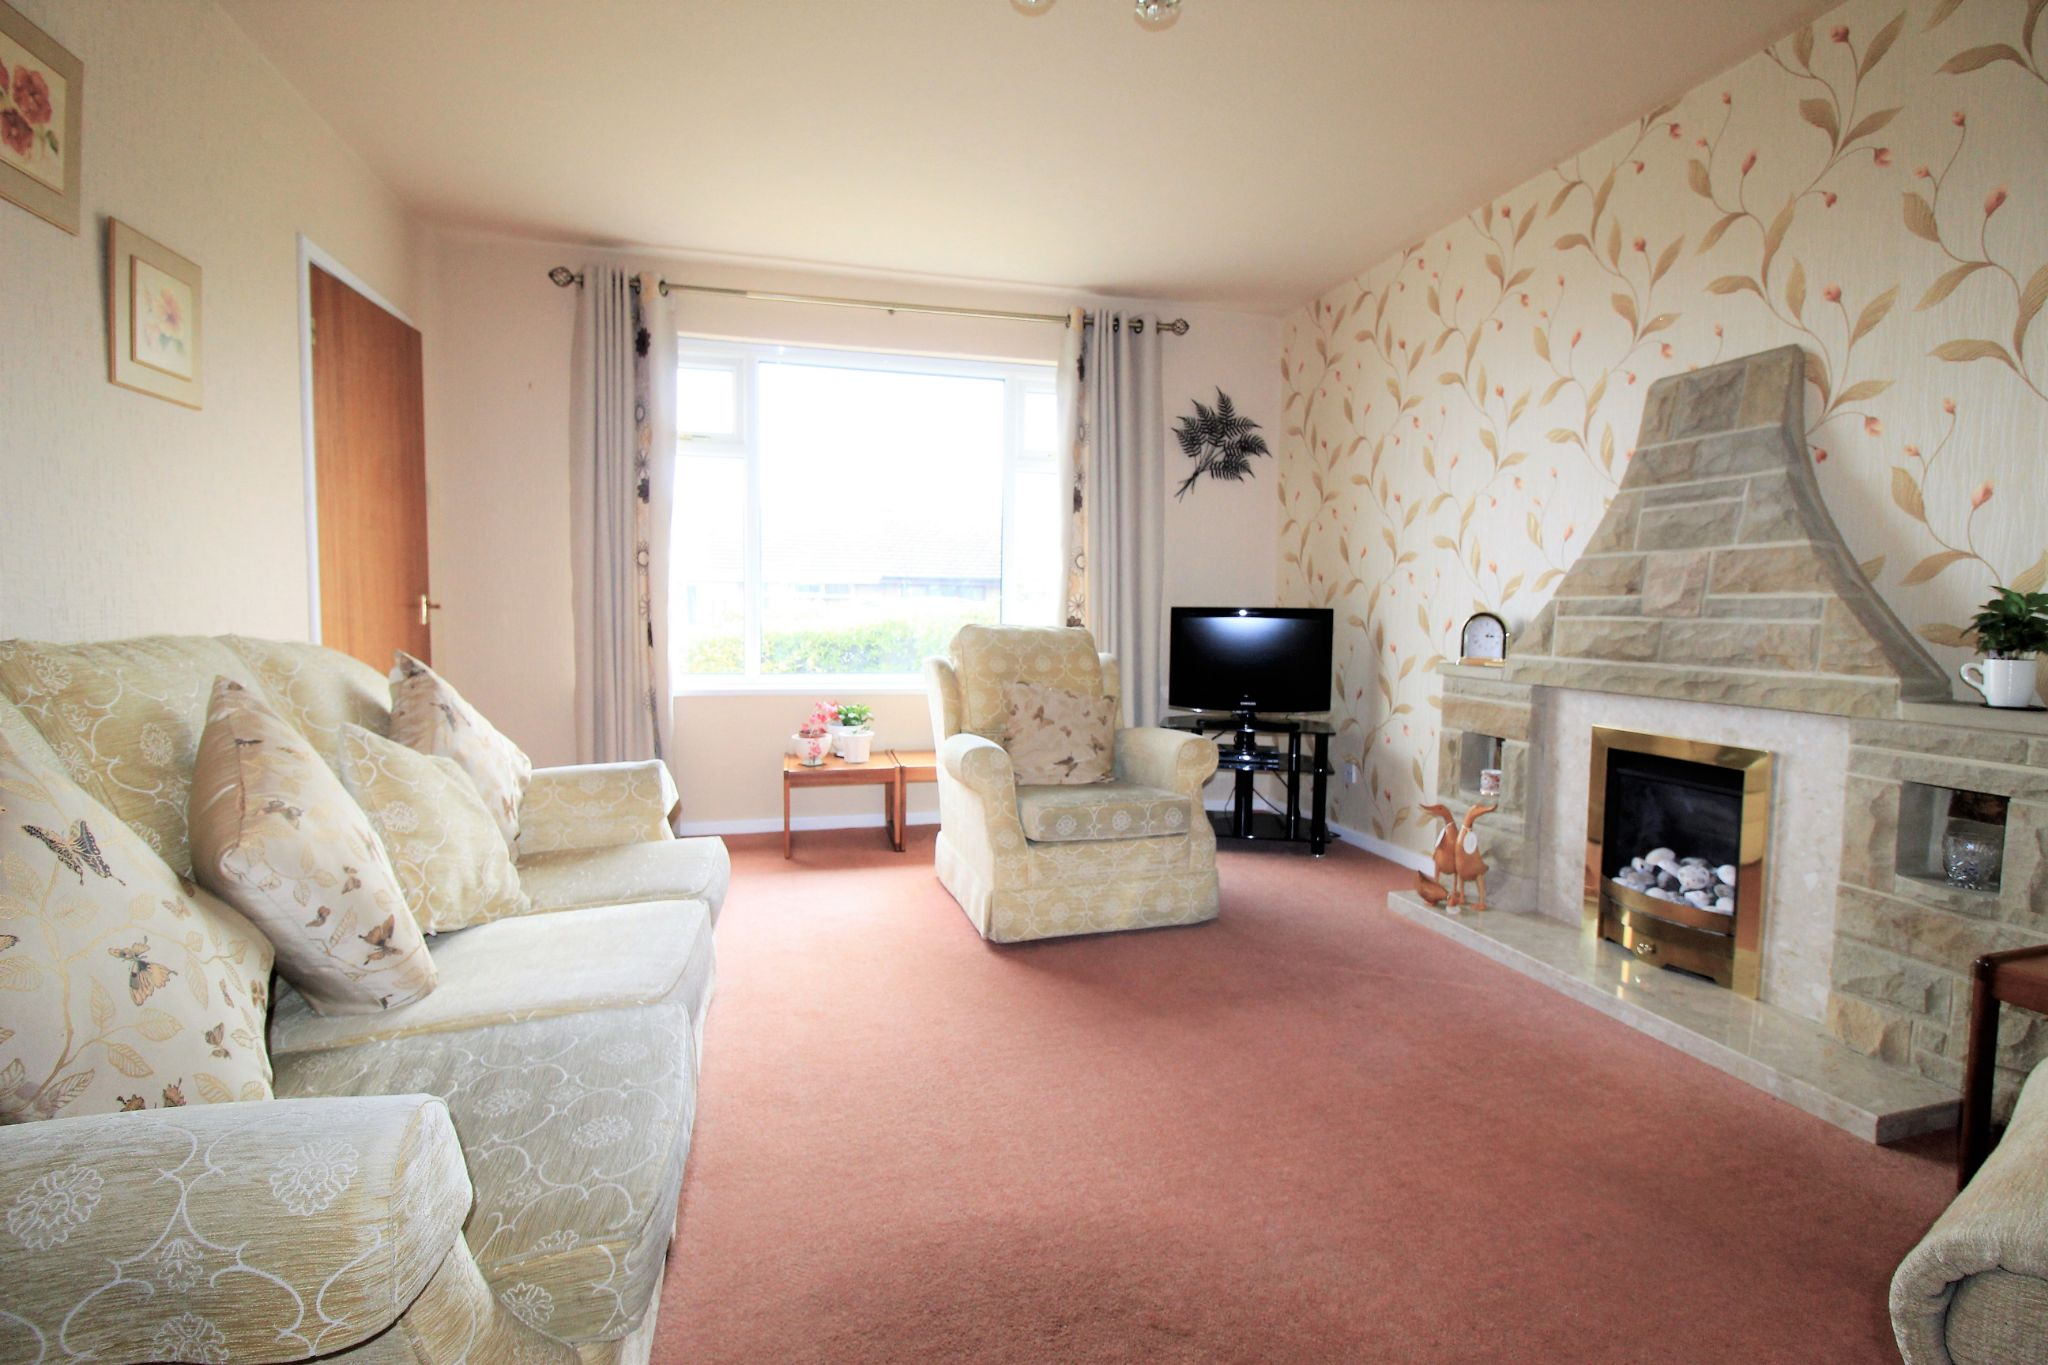 2 bedroom semi-detached bungalow SSTC in Bradford - Lounge